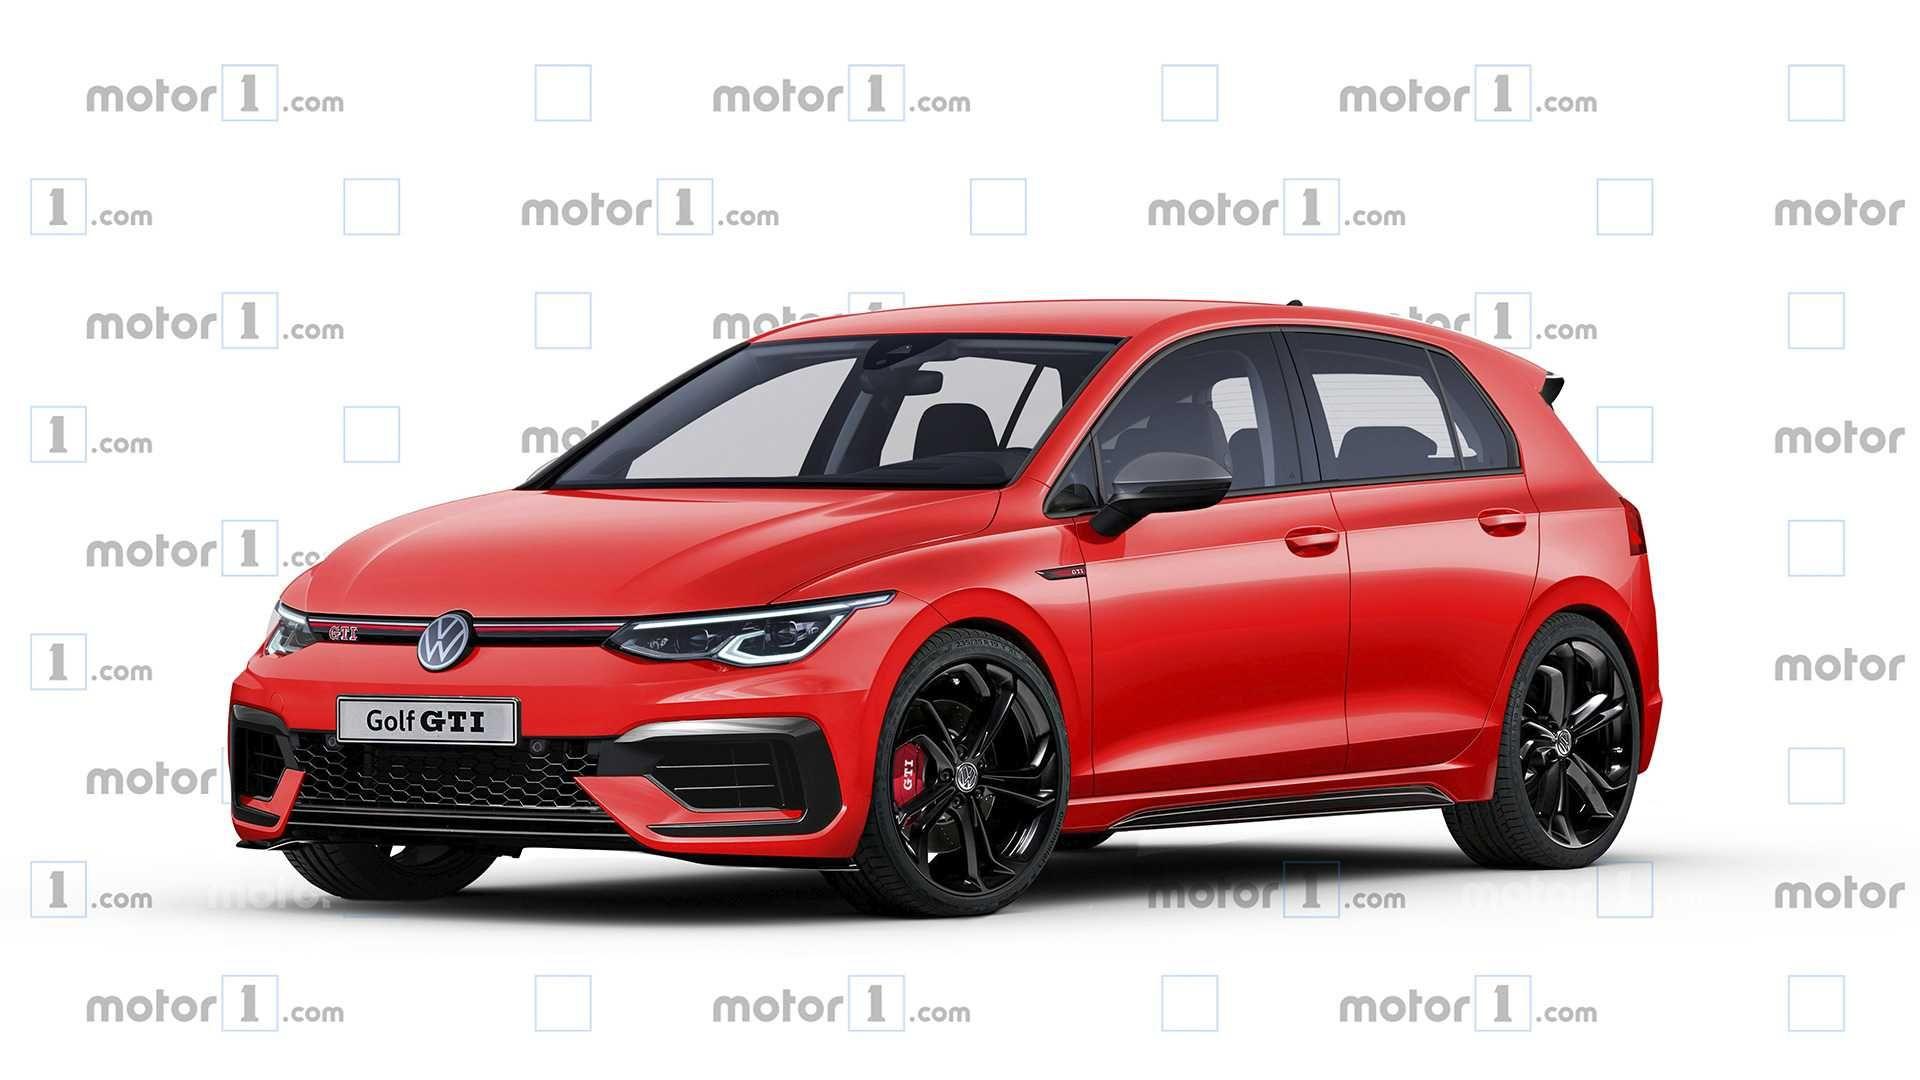 New Vw Golf Mk8 Fresh Pictures Of High Tech Interior Car Magazine In 2021 Vw Golf Golf Gti Gti